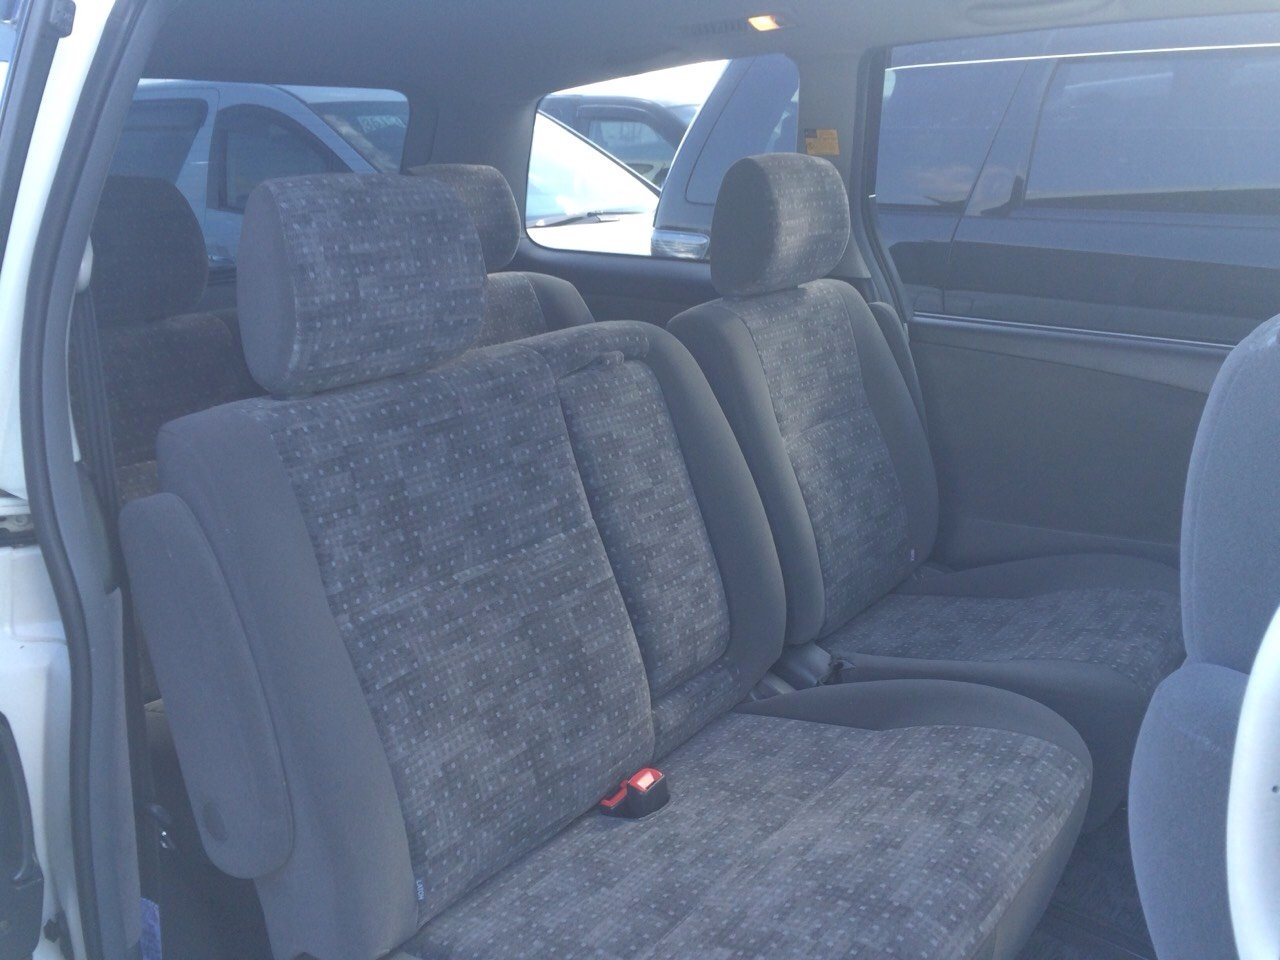 2005 Toyota Estima 3L 2WD 7 seater back seat